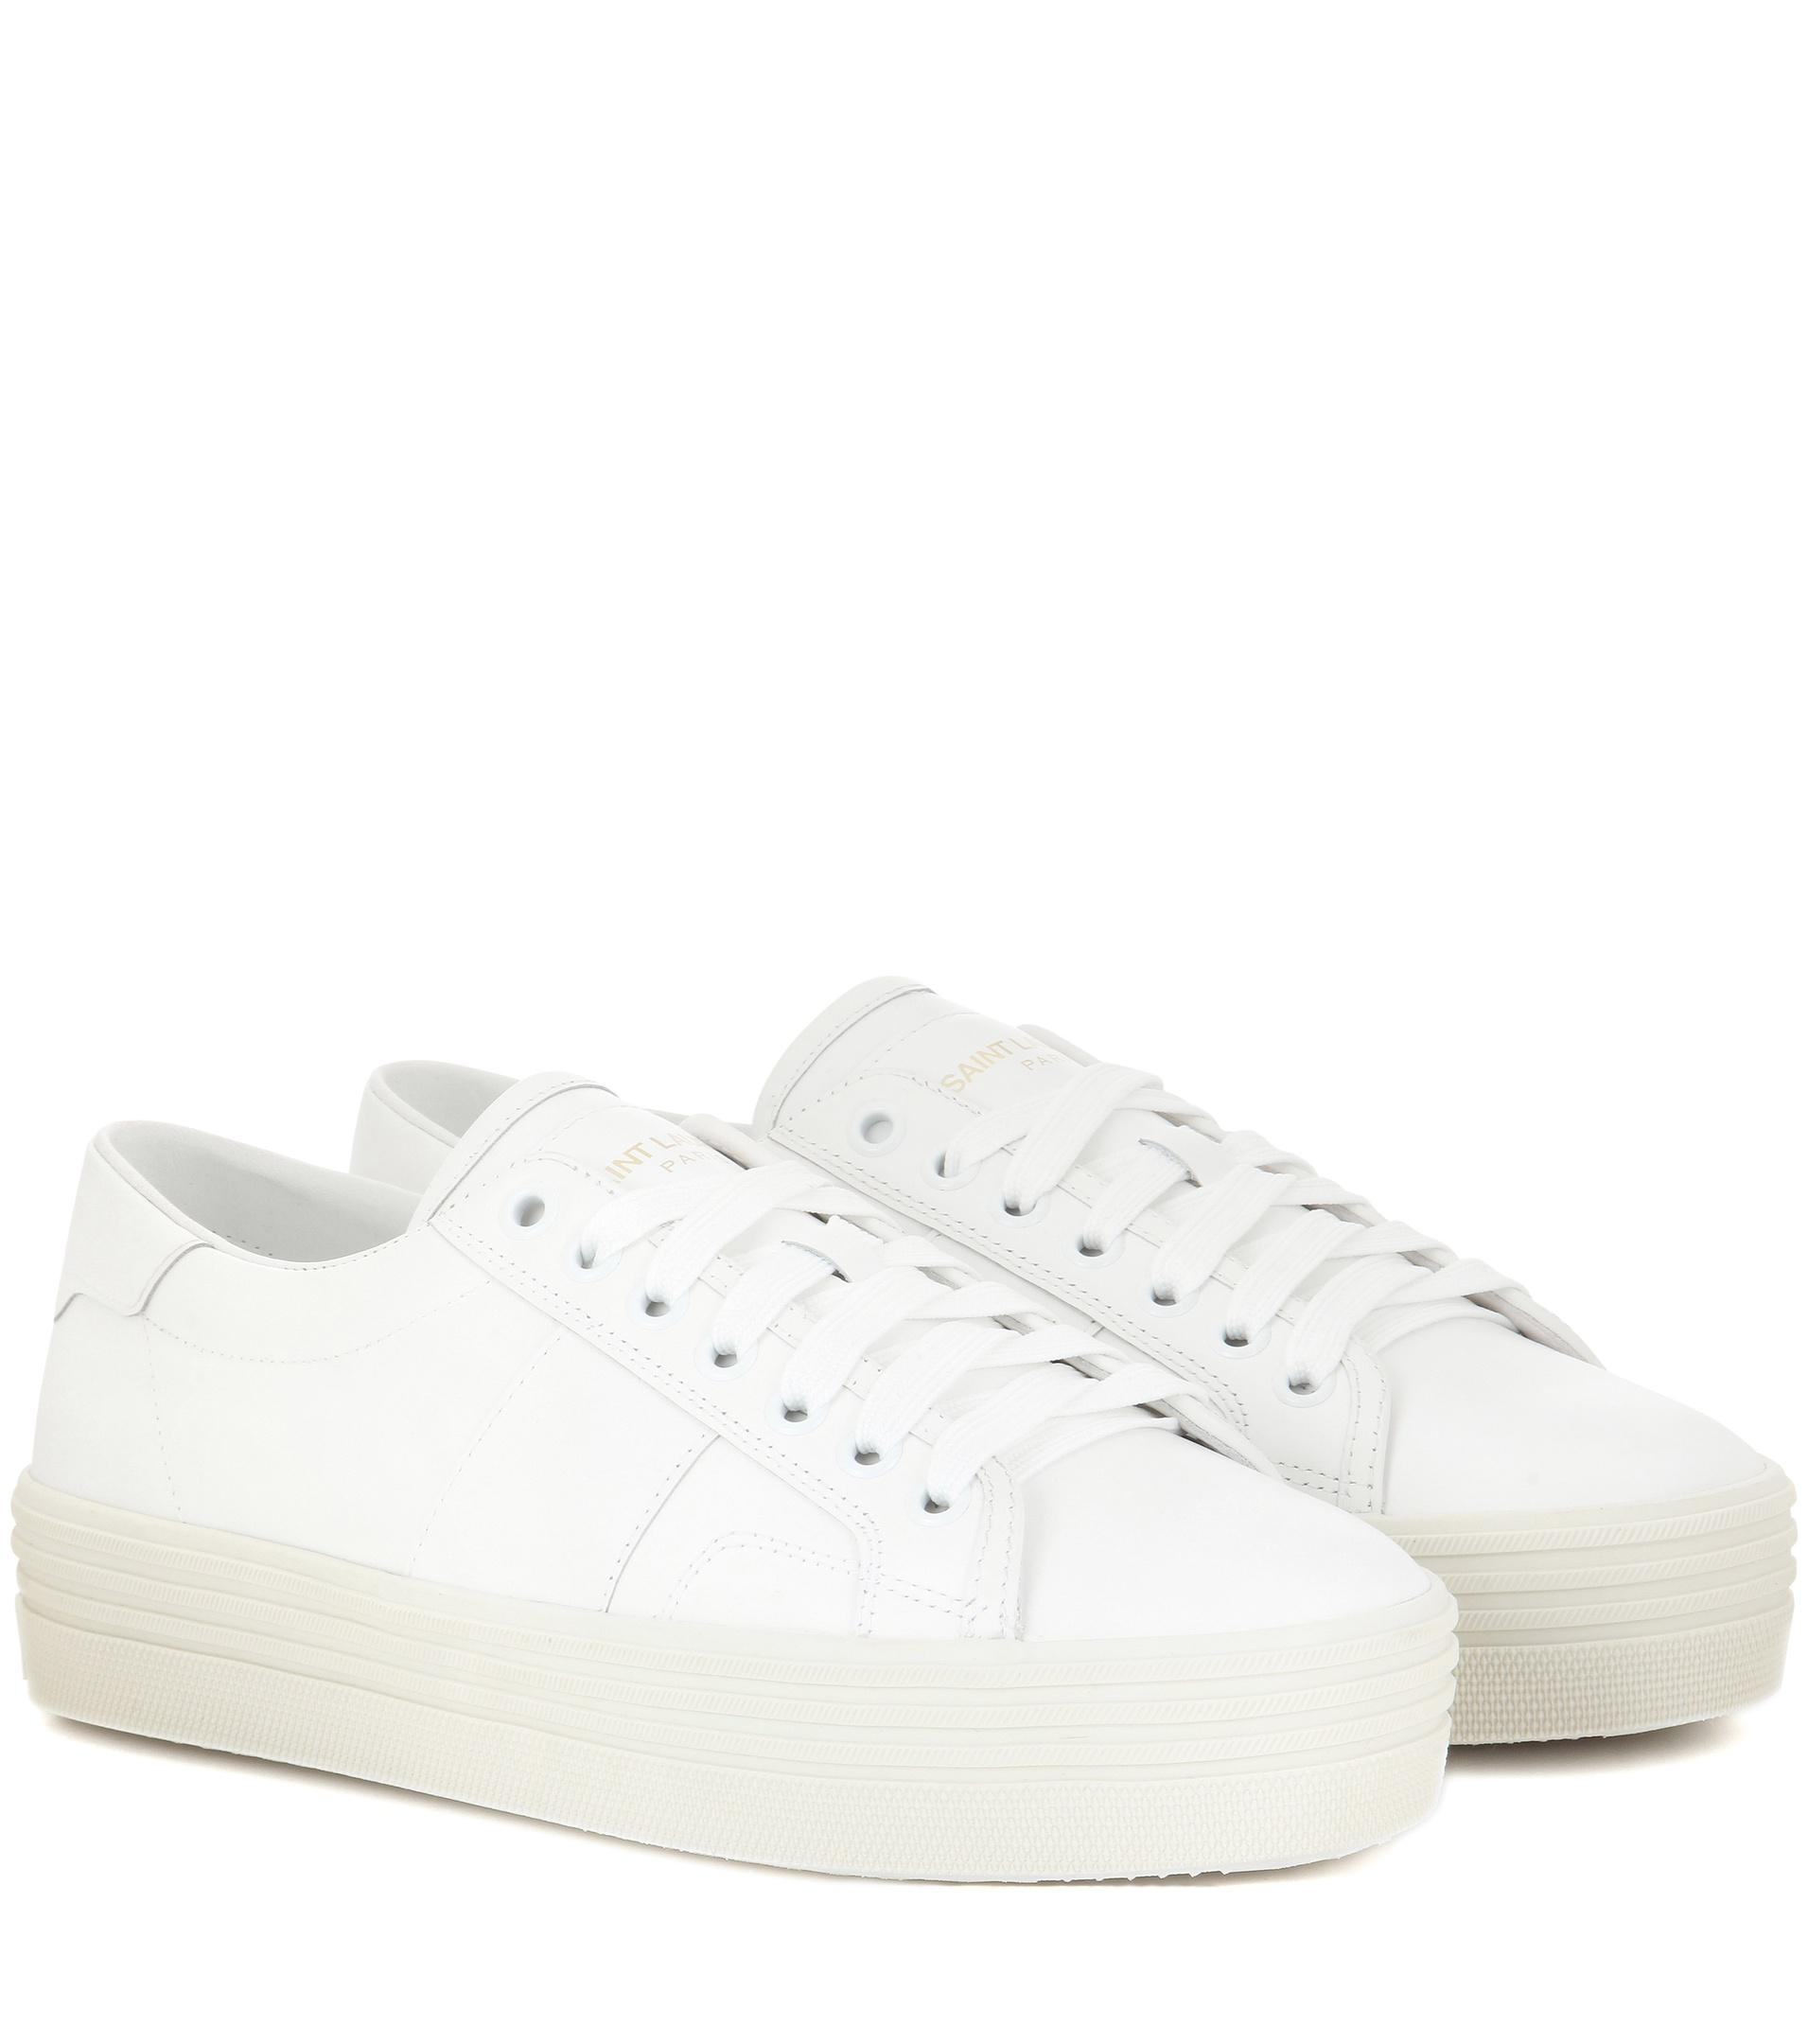 Signature Court sneakers - White Saint Laurent j0I86YQh8